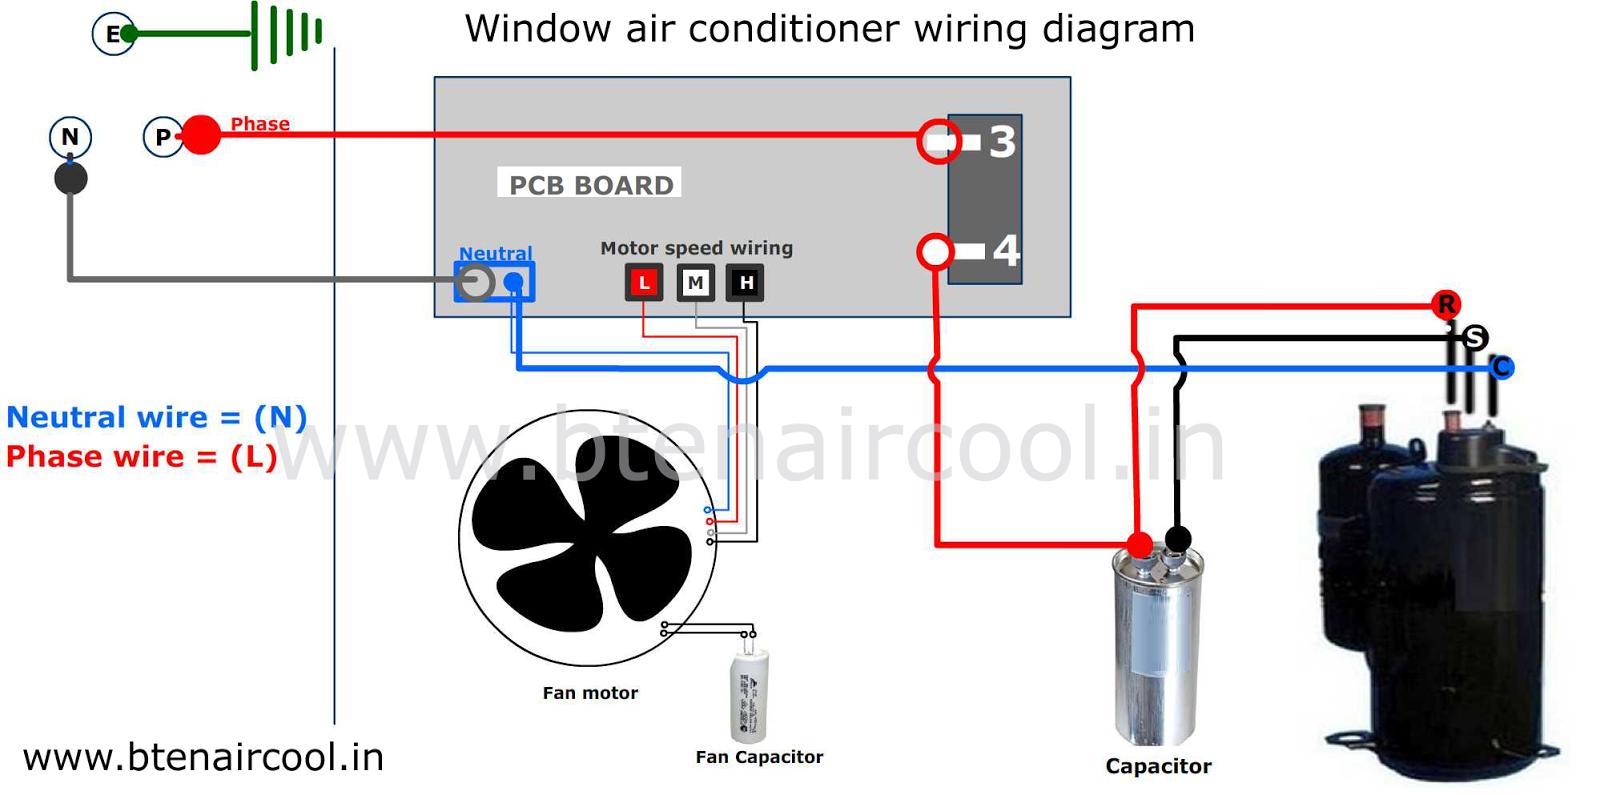 YE_4065] Window Unit Air Conditioner Wiring Diagrams Schematic Wiring | Window Aircon Wiring Diagram |  | Atota Tixat Otene Apom Cette Mohammedshrine Librar Wiring 101